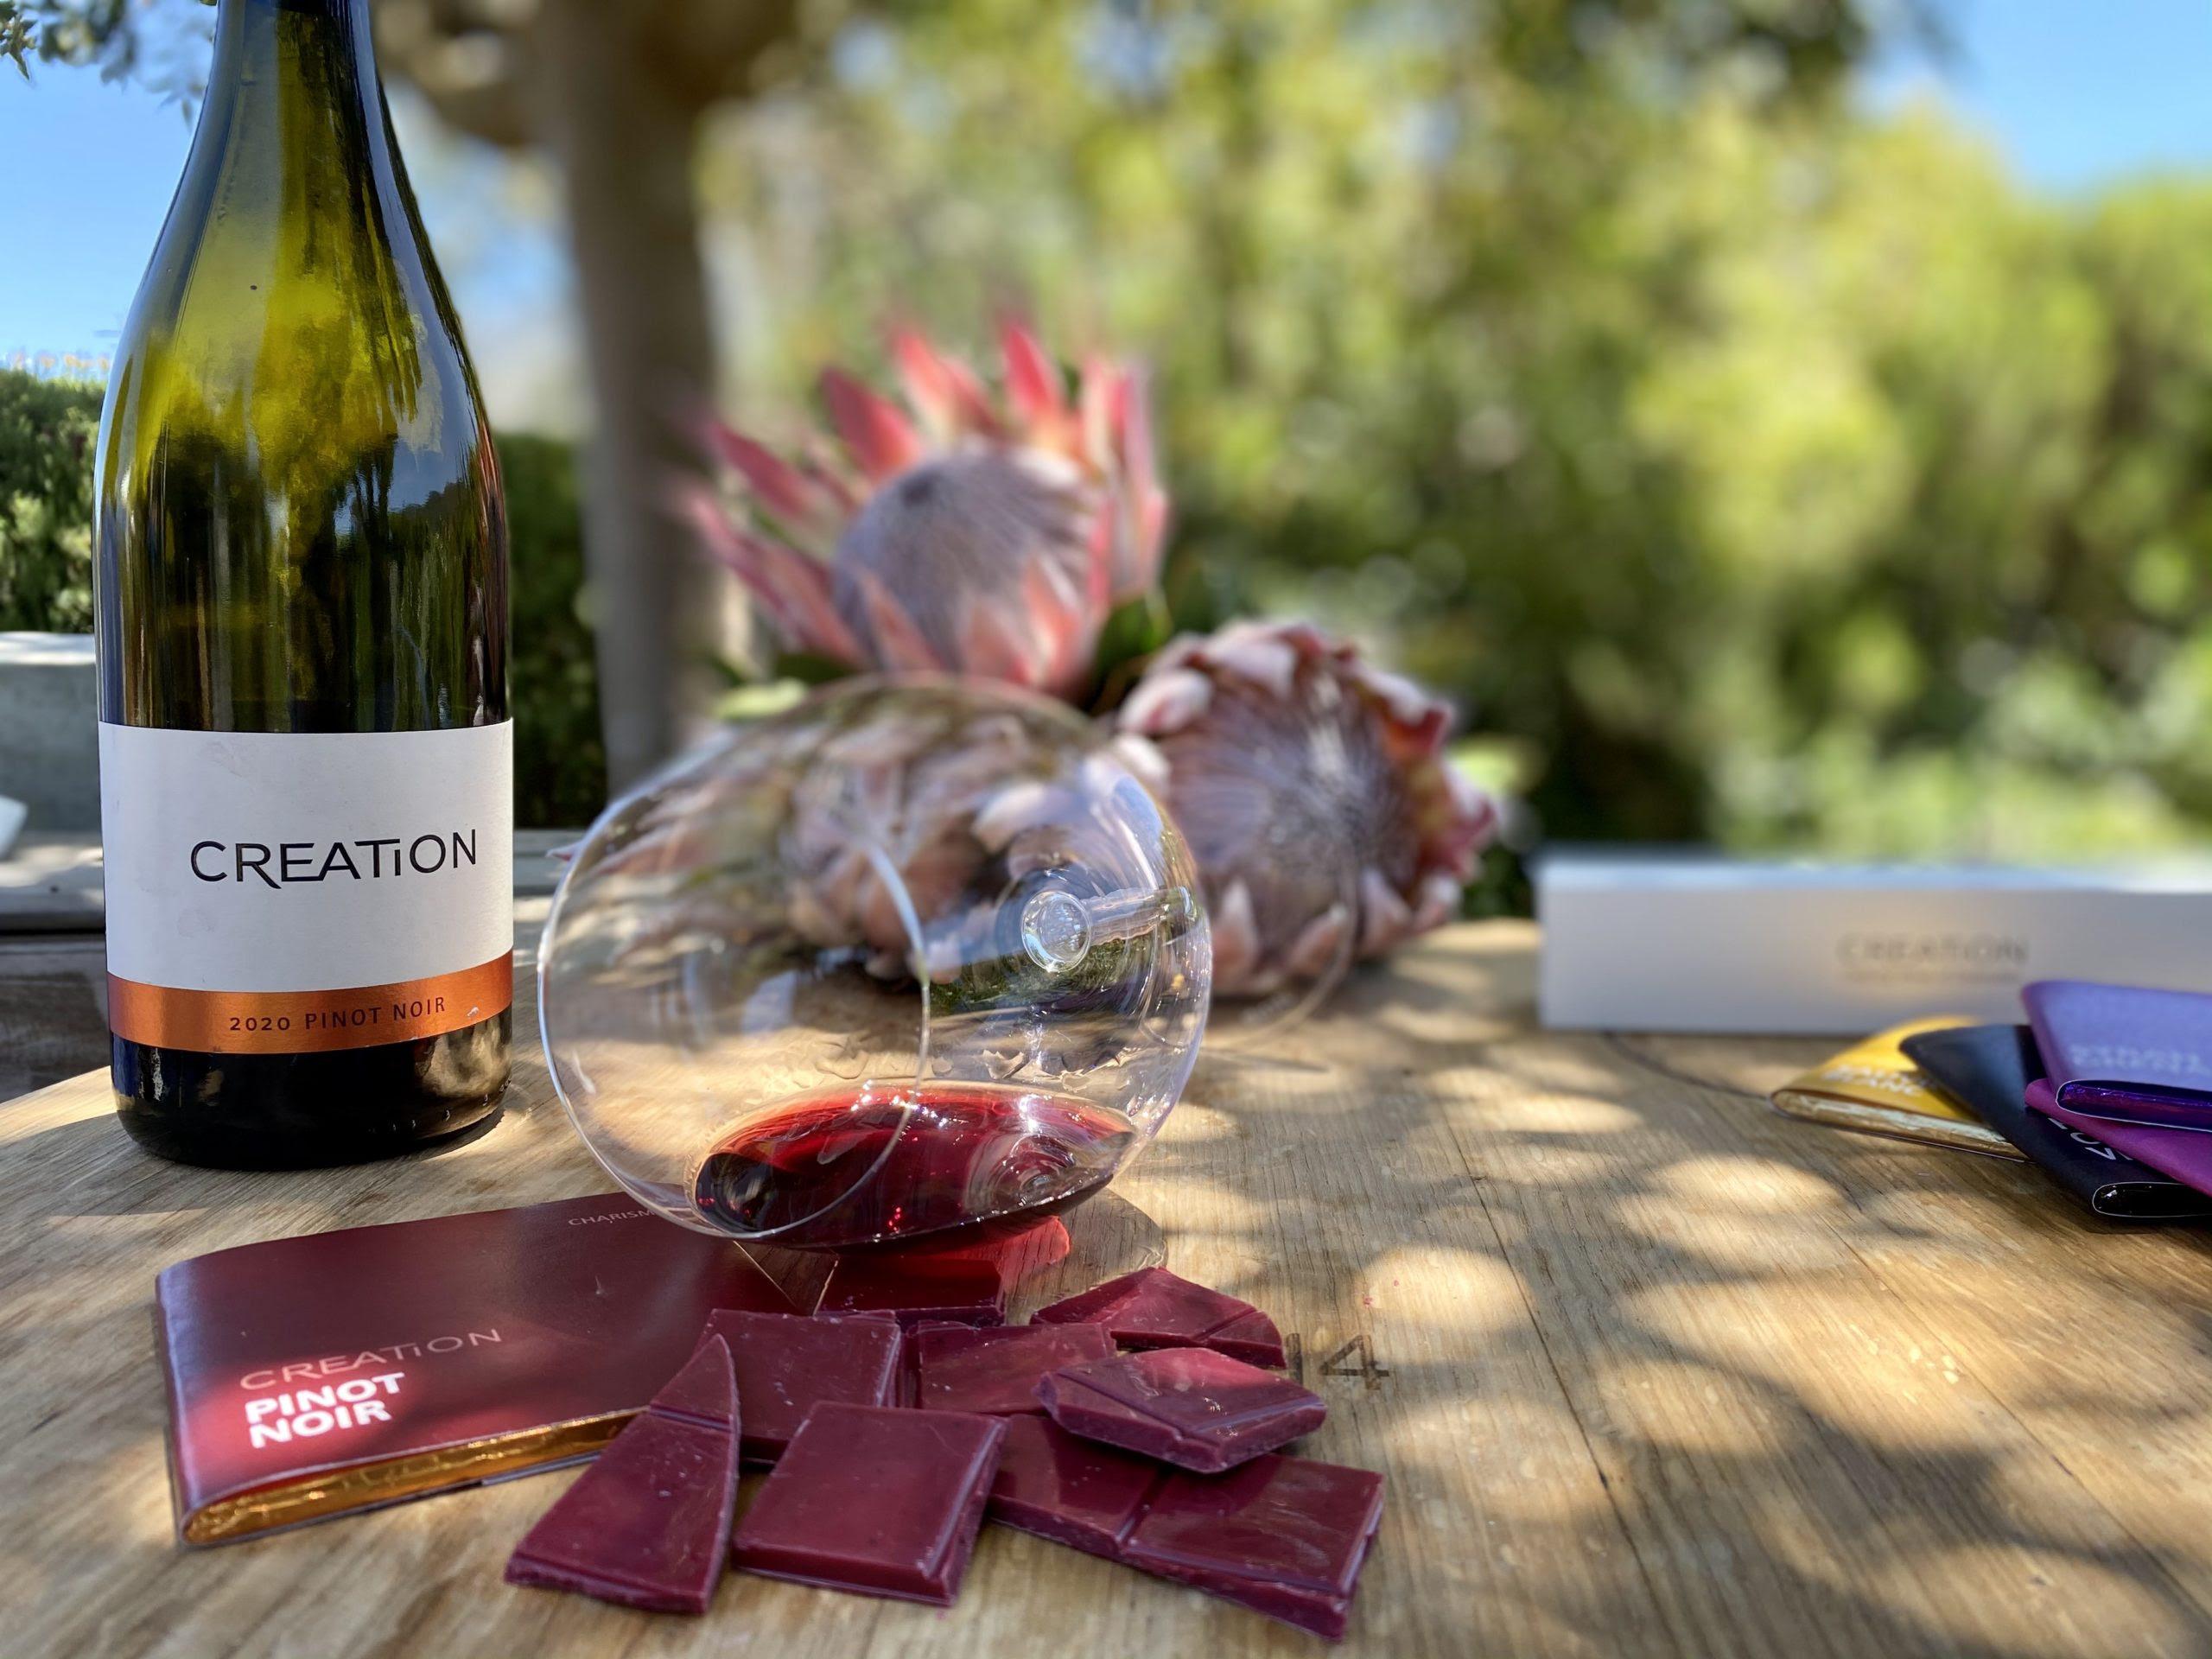 Creation Wines and Von Geusau Chocolates: A World of Passion photo